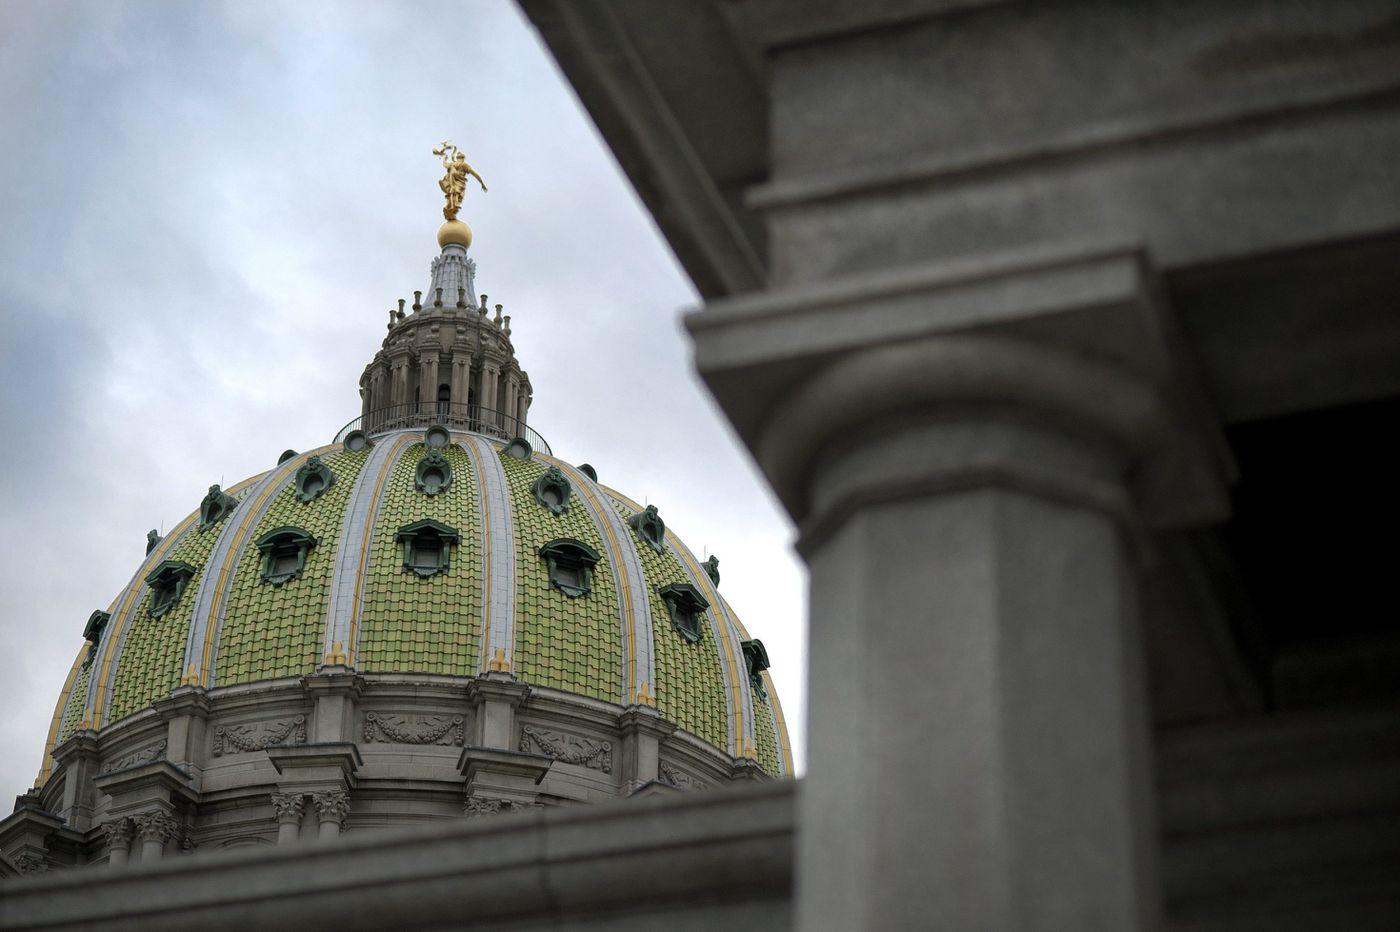 Pa. Senate passes anti-gerrymandering bill with 'poison pill' judicial districting amendment